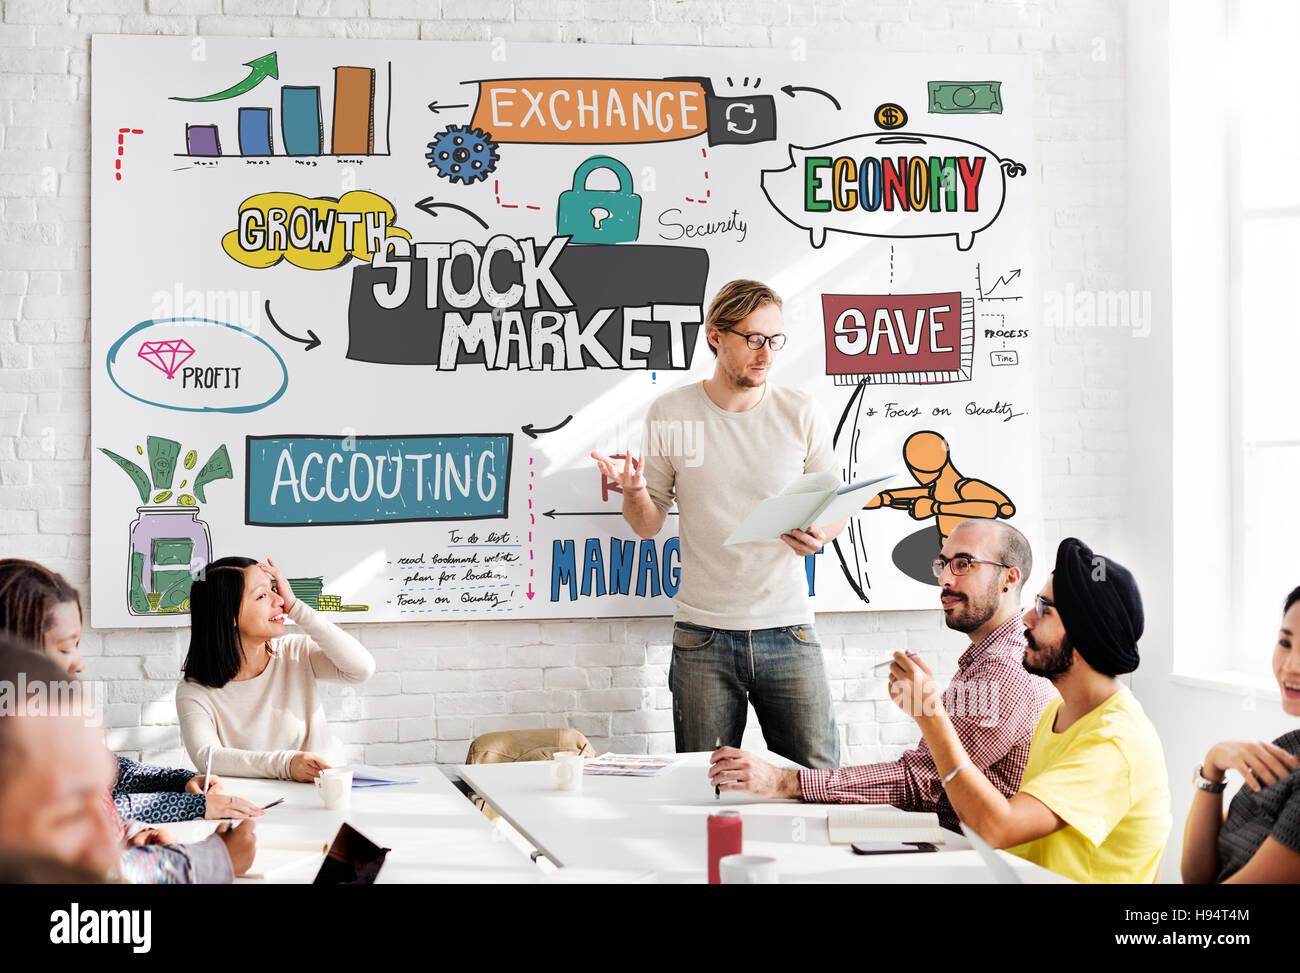 Stock Market Finance Exchange Economy Forex Concept - Stock Image